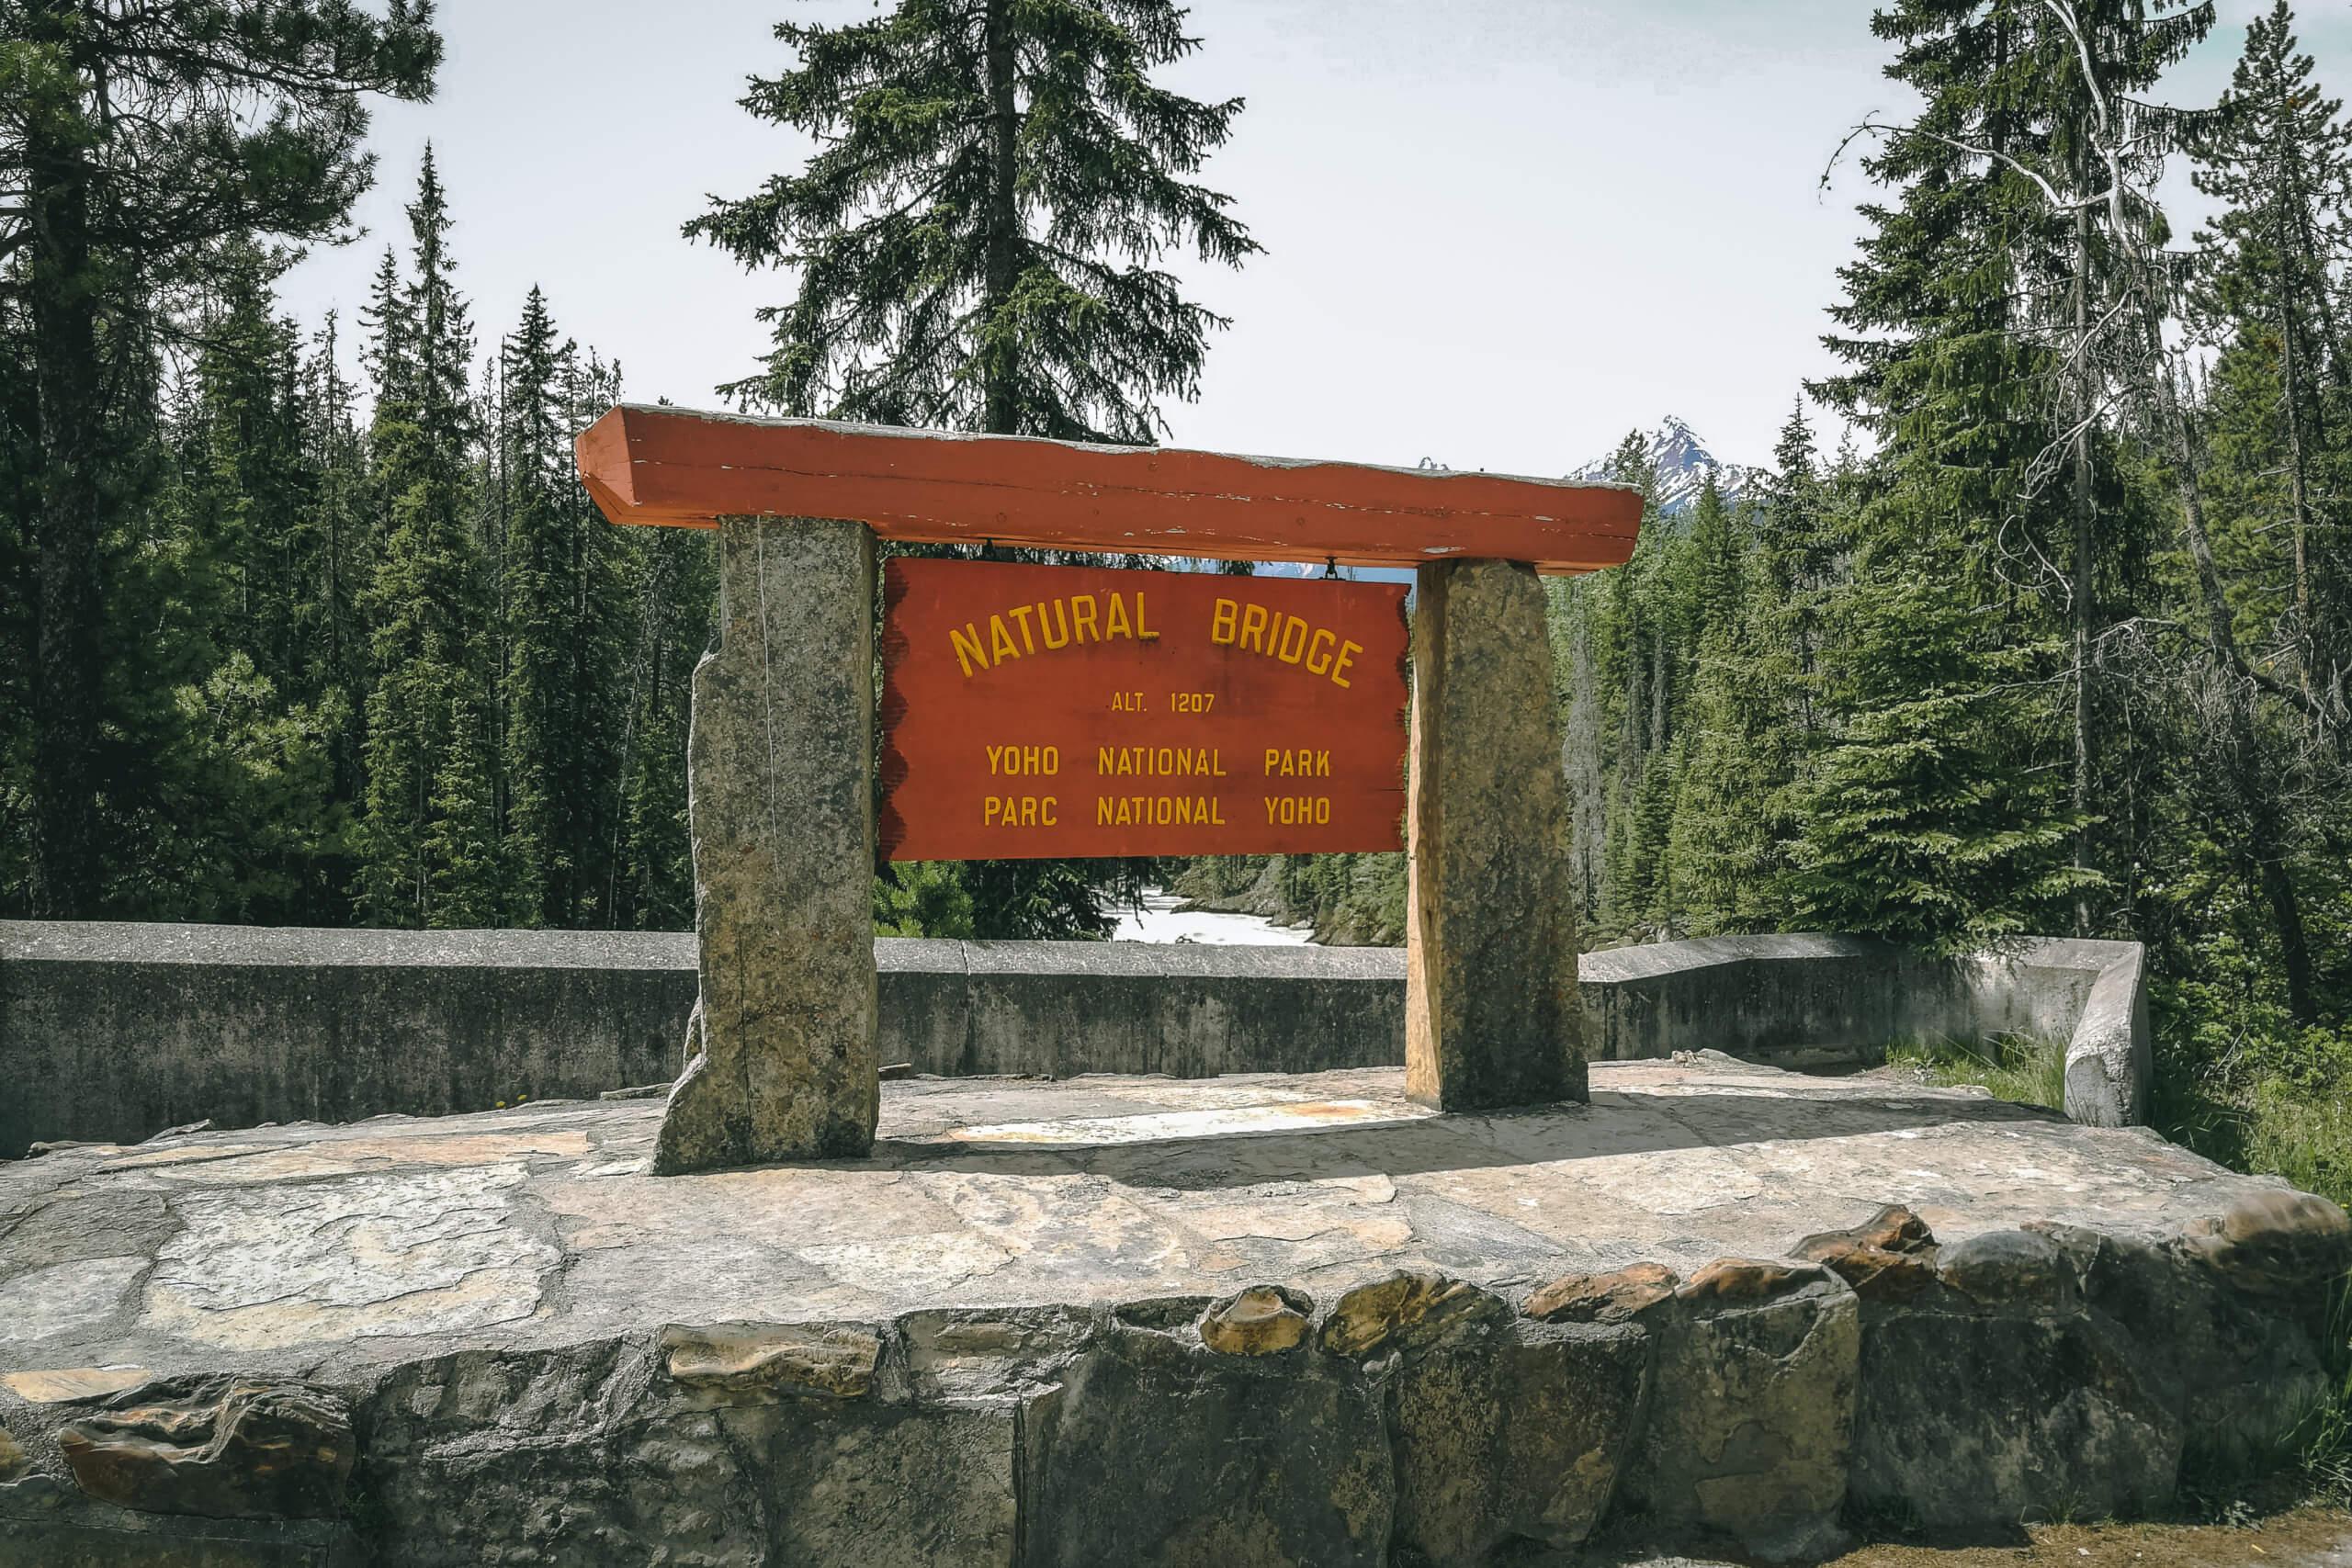 Schild Natural Bridge Yoho National Park